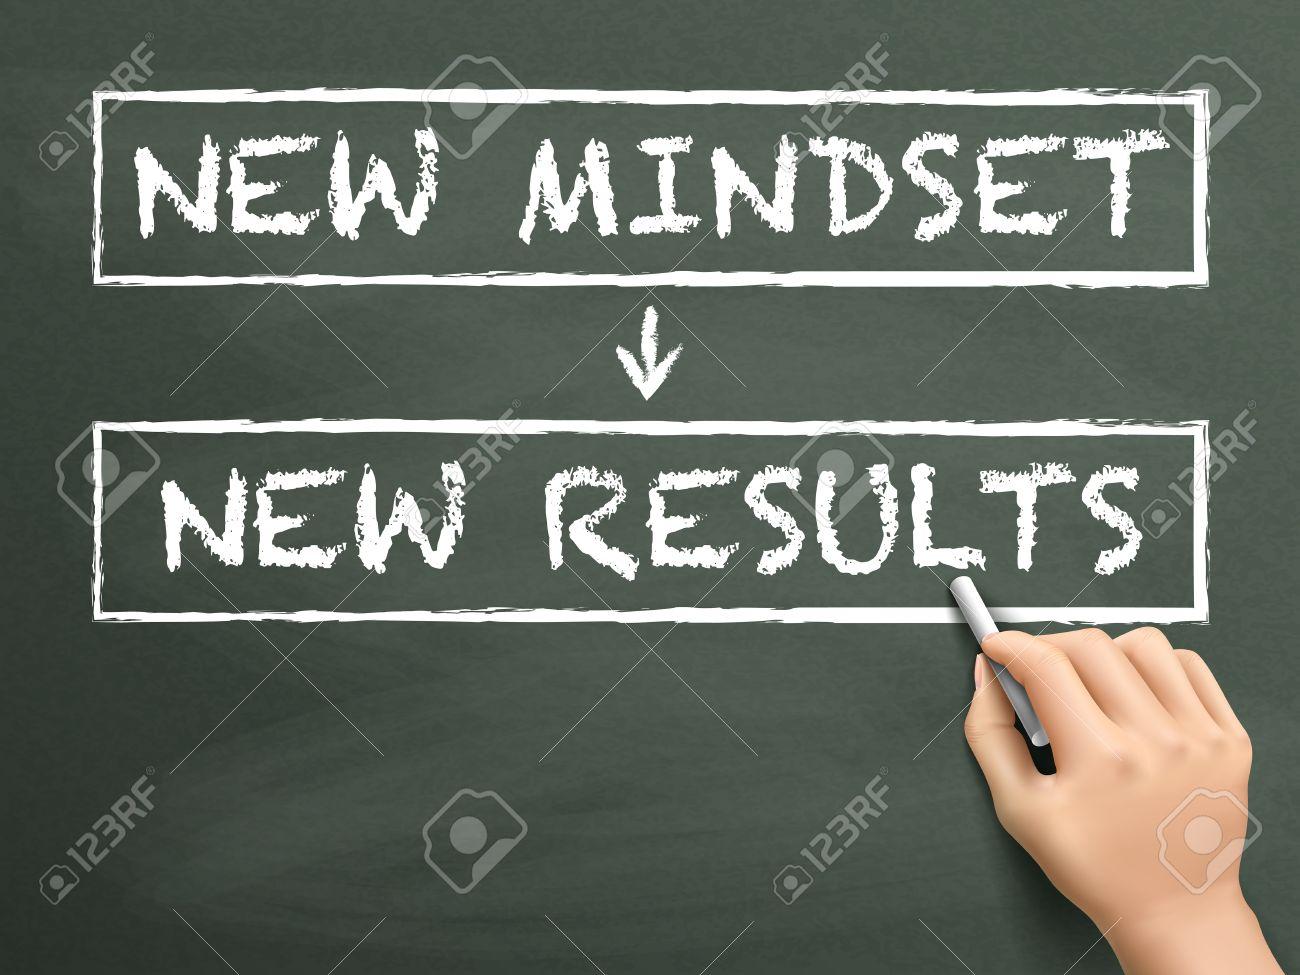 new mindset make new results written by hand on blackboard - 34041046